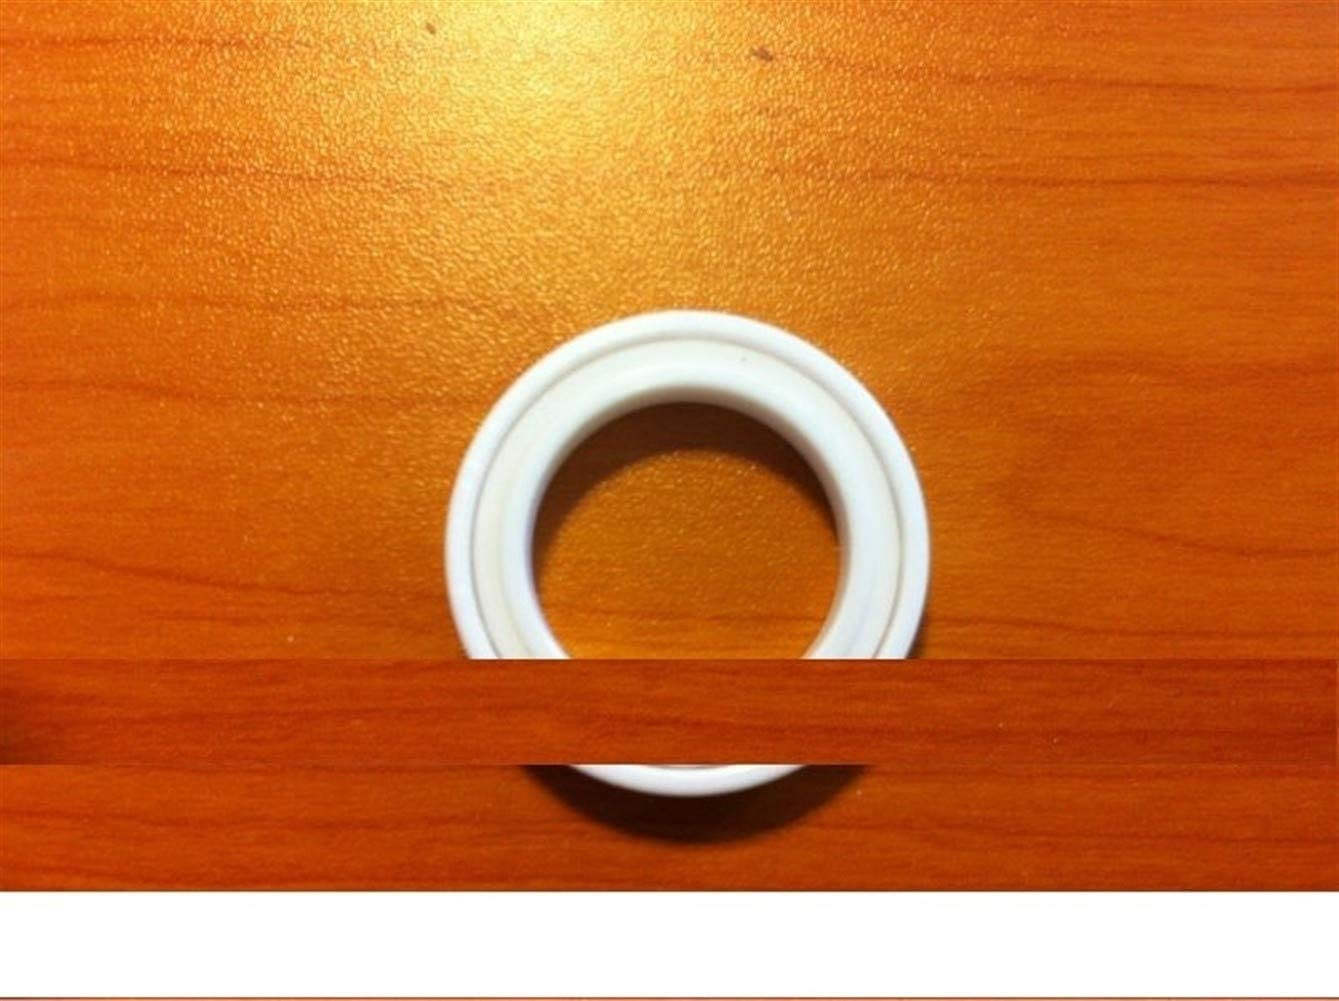 40527 mm 6808CE All Zirconia Ceramic 6808 Ball Bearings Ball Bearing 1 PC no logo Durable 6808 ZrO2 Material Full Ceramic Bearing